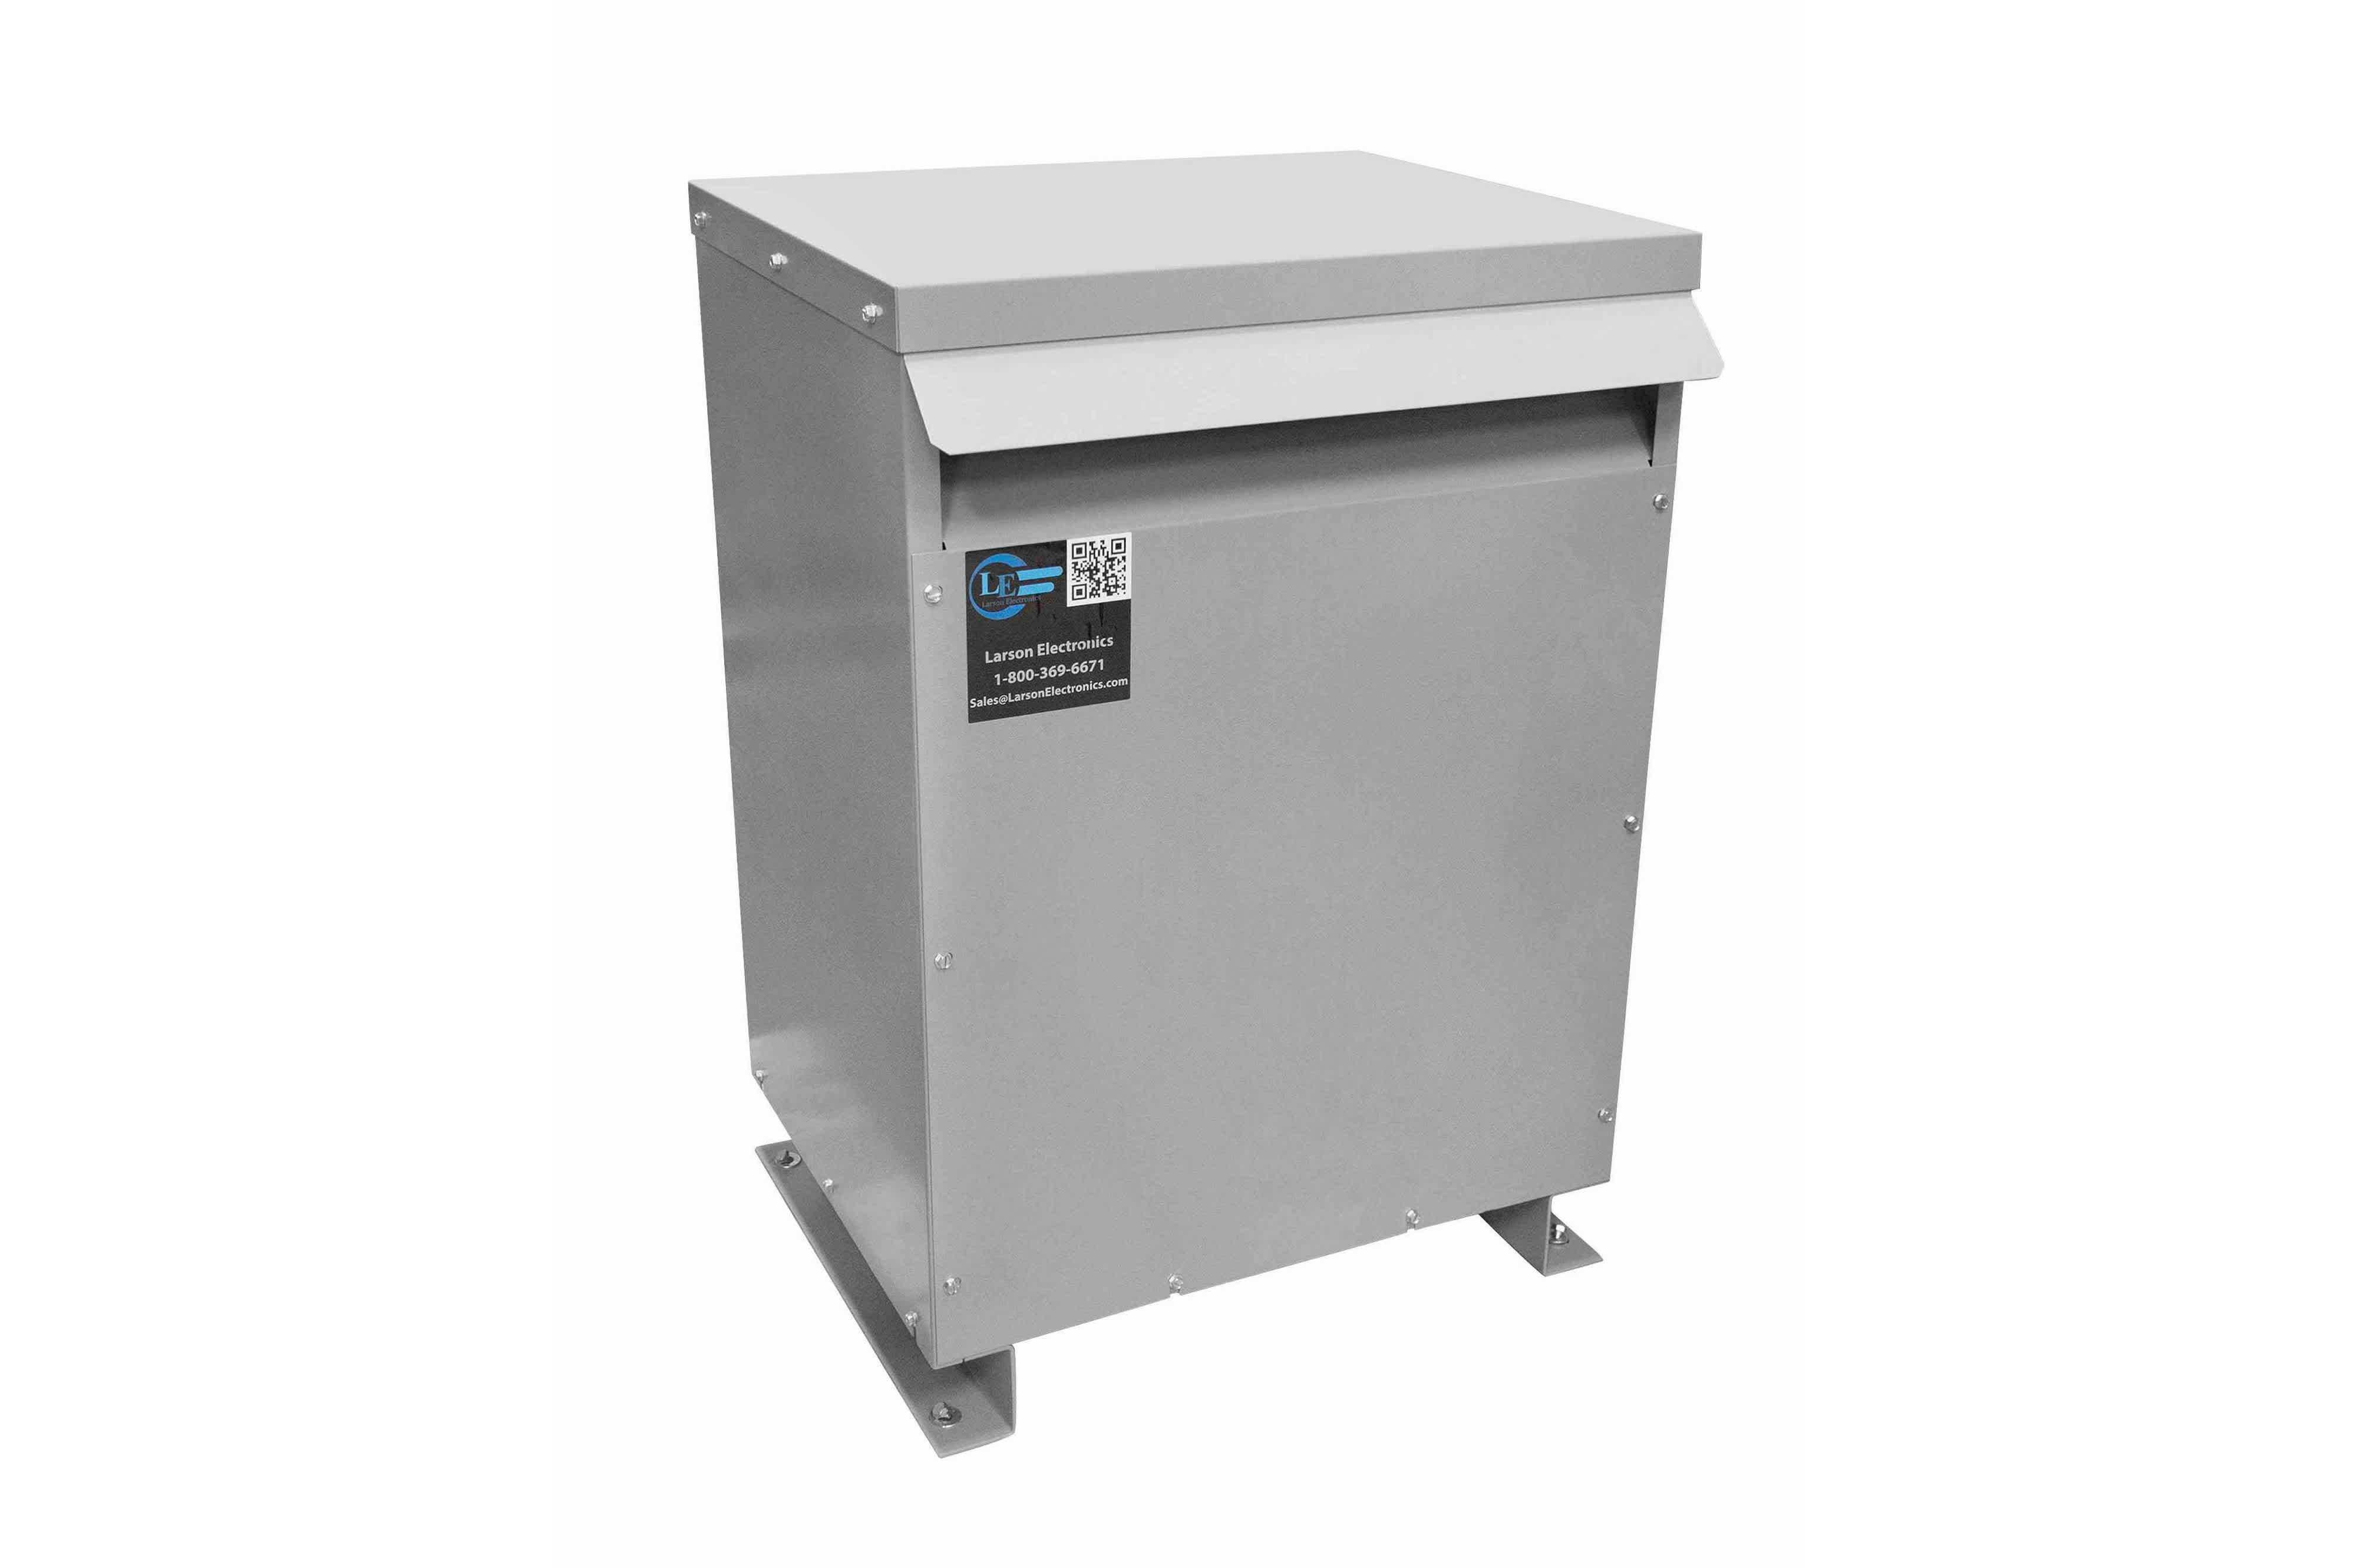 150 kVA 3PH Isolation Transformer, 575V Wye Primary, 415Y/240 Wye-N Secondary, N3R, Ventilated, 60 Hz